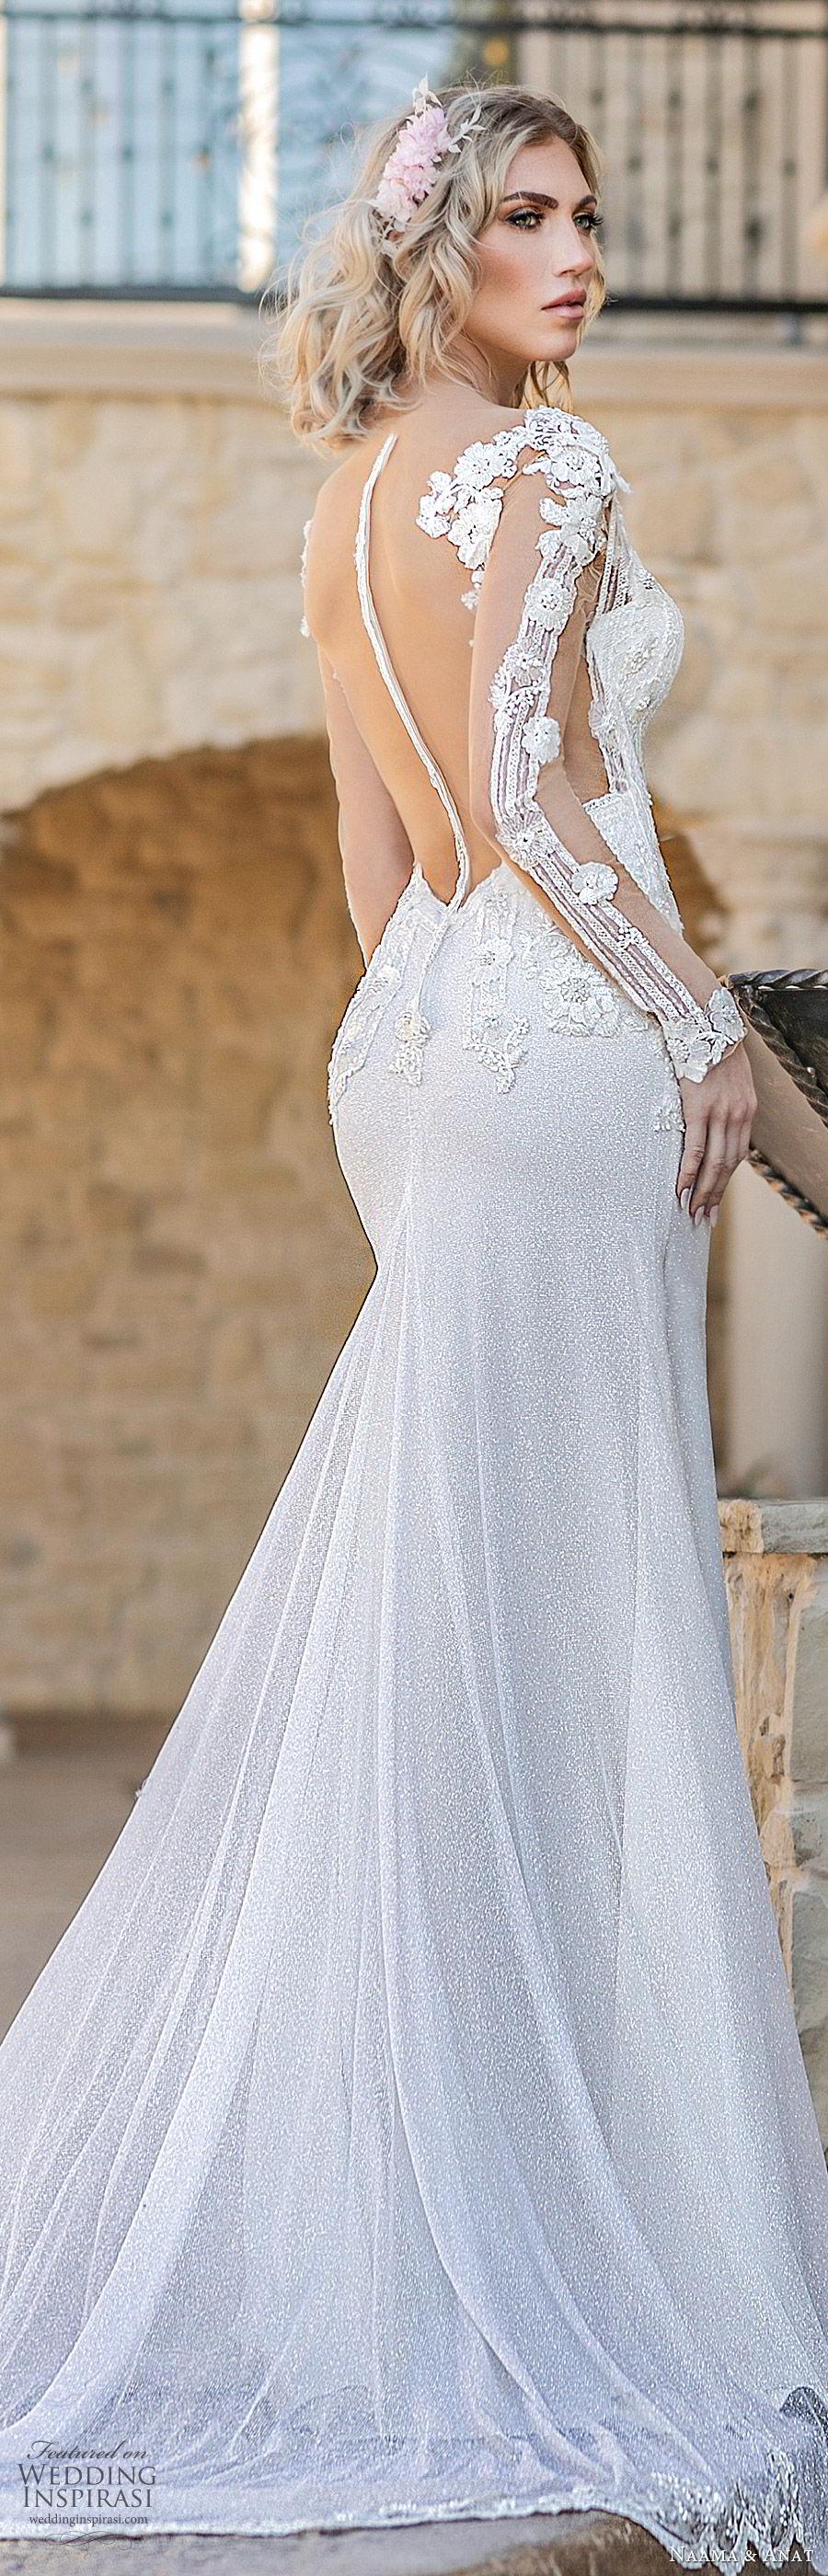 naama anat spring 2020 bridal illusion long sleeves split deep v neckline fully embellished sheath wedding dress (4) sheer back chapel train elegant glam zbv